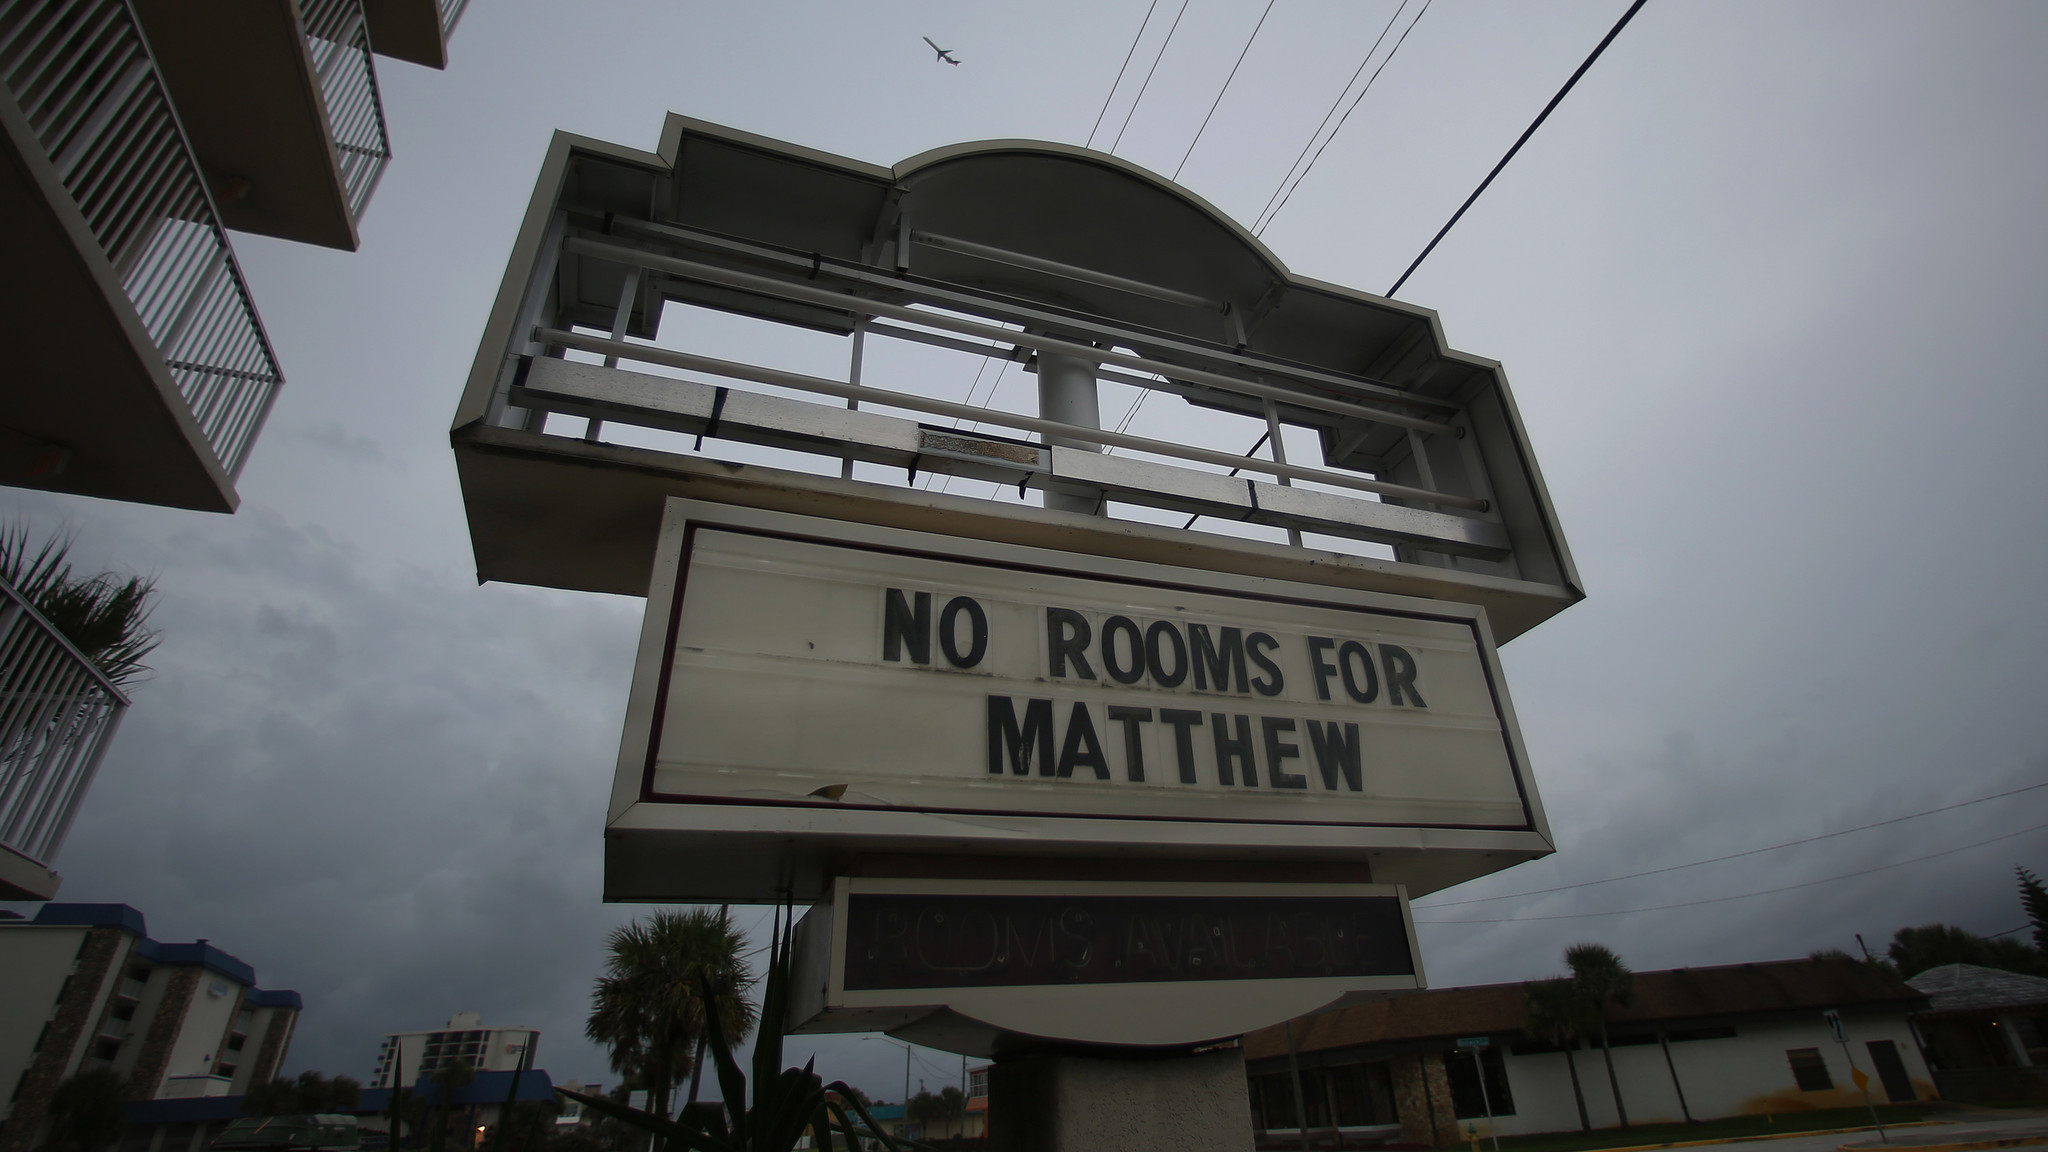 Gas Prices In Orlando Florida >> Hurricane Matthew spurs 2,700 price-gouging complaints